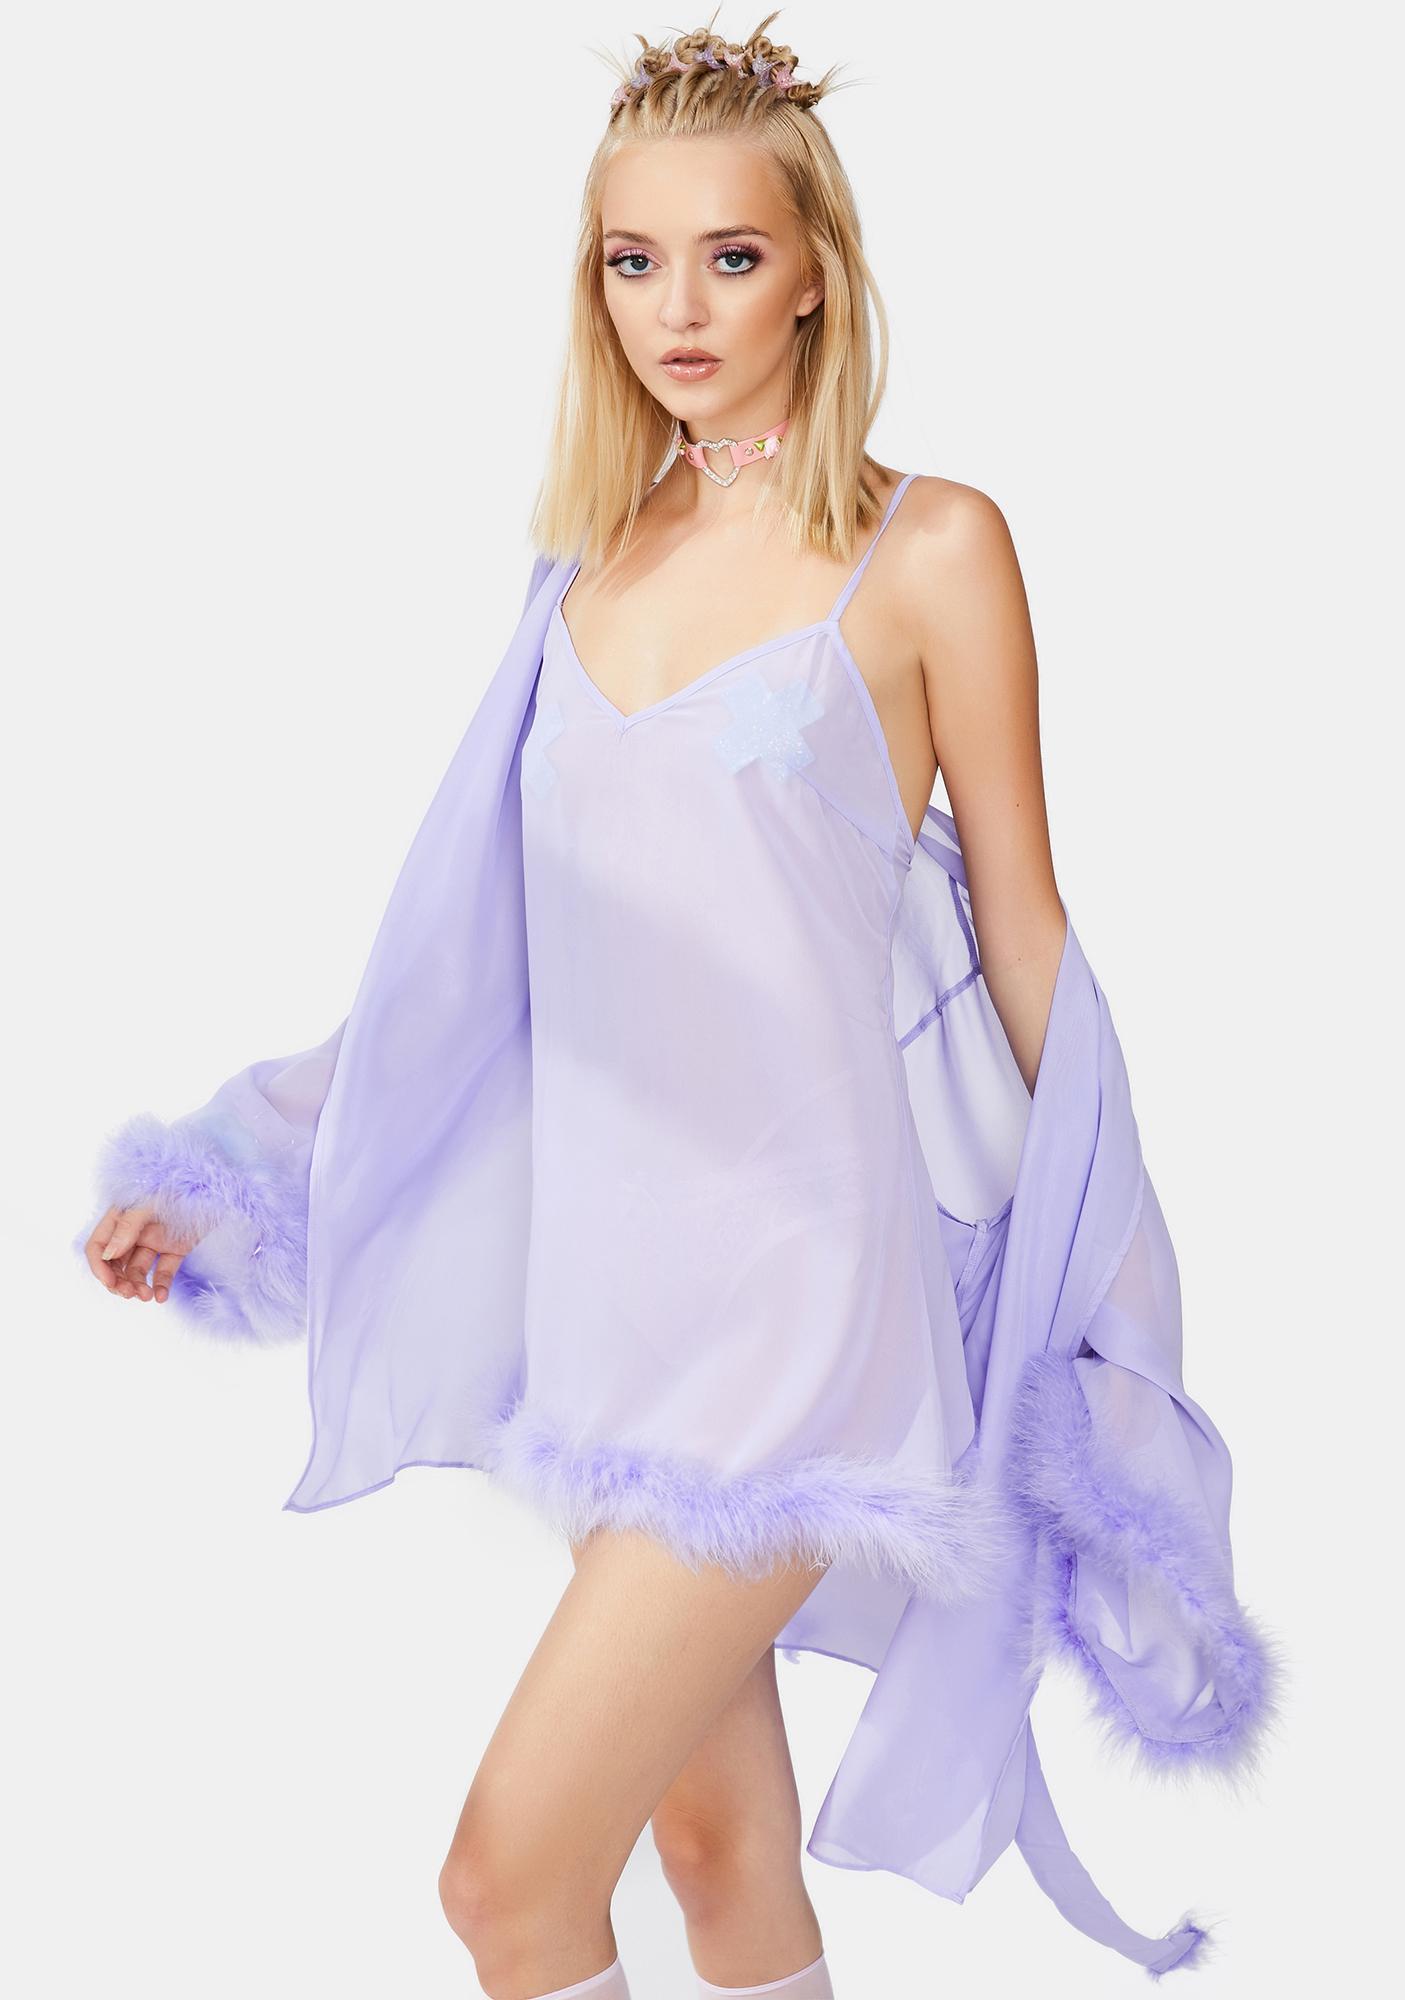 Playful Promises X Betty Page Lilac Chiffon Feather Babydoll Chemise